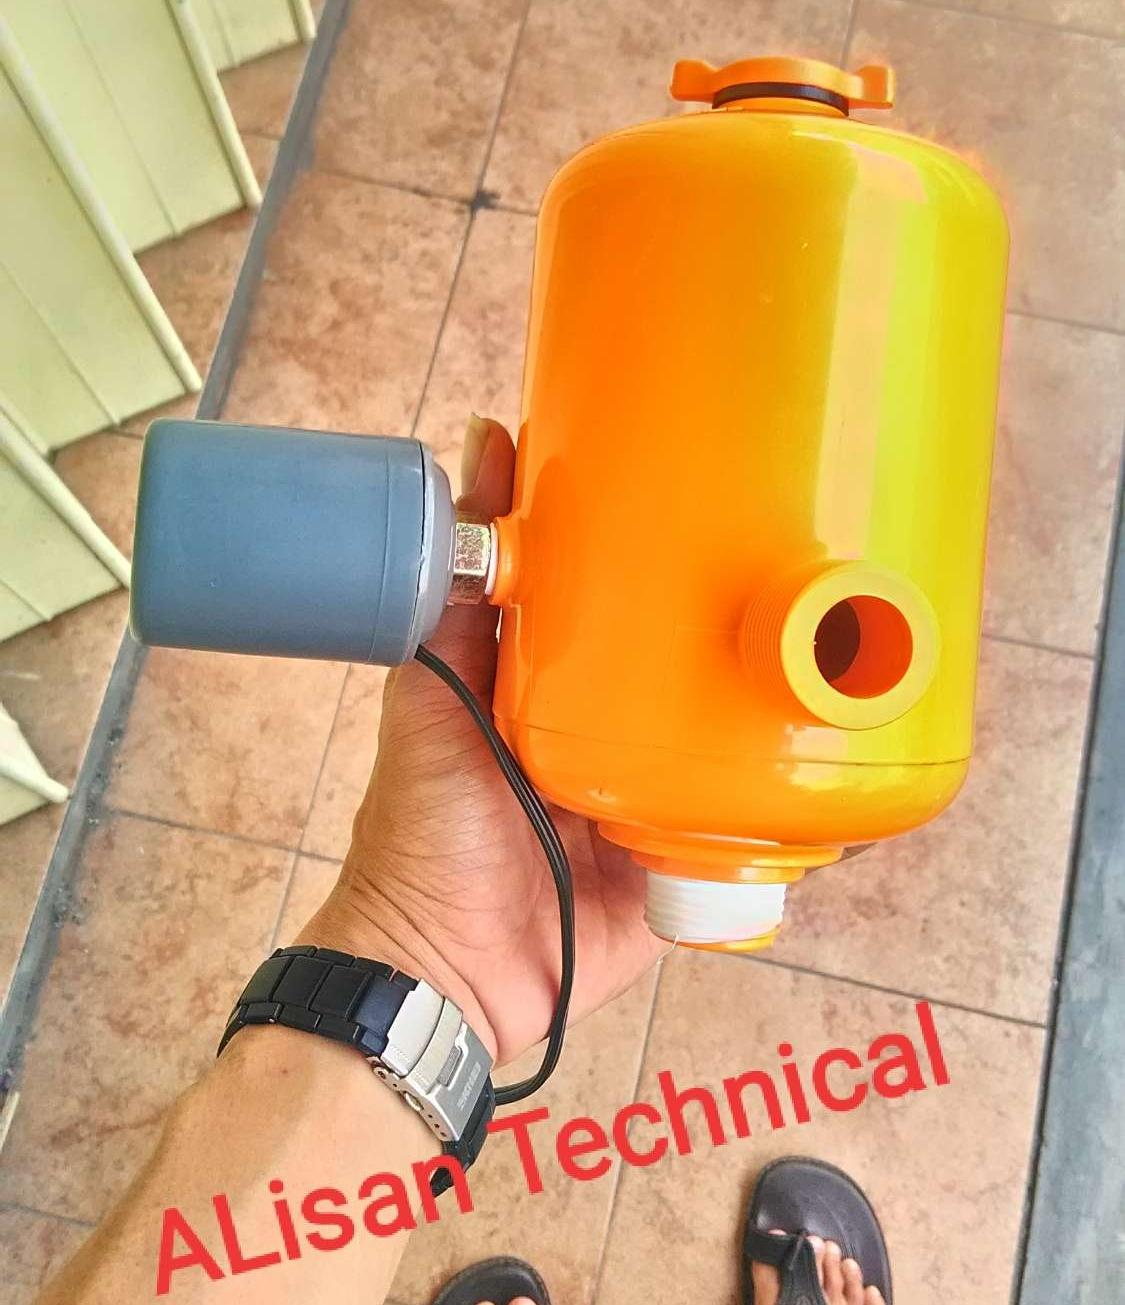 Tabung Otomatis Pompa Air Fiber Komplit Shimizu Wasser Panasonic Sanyo Dab Lazada Indonesia